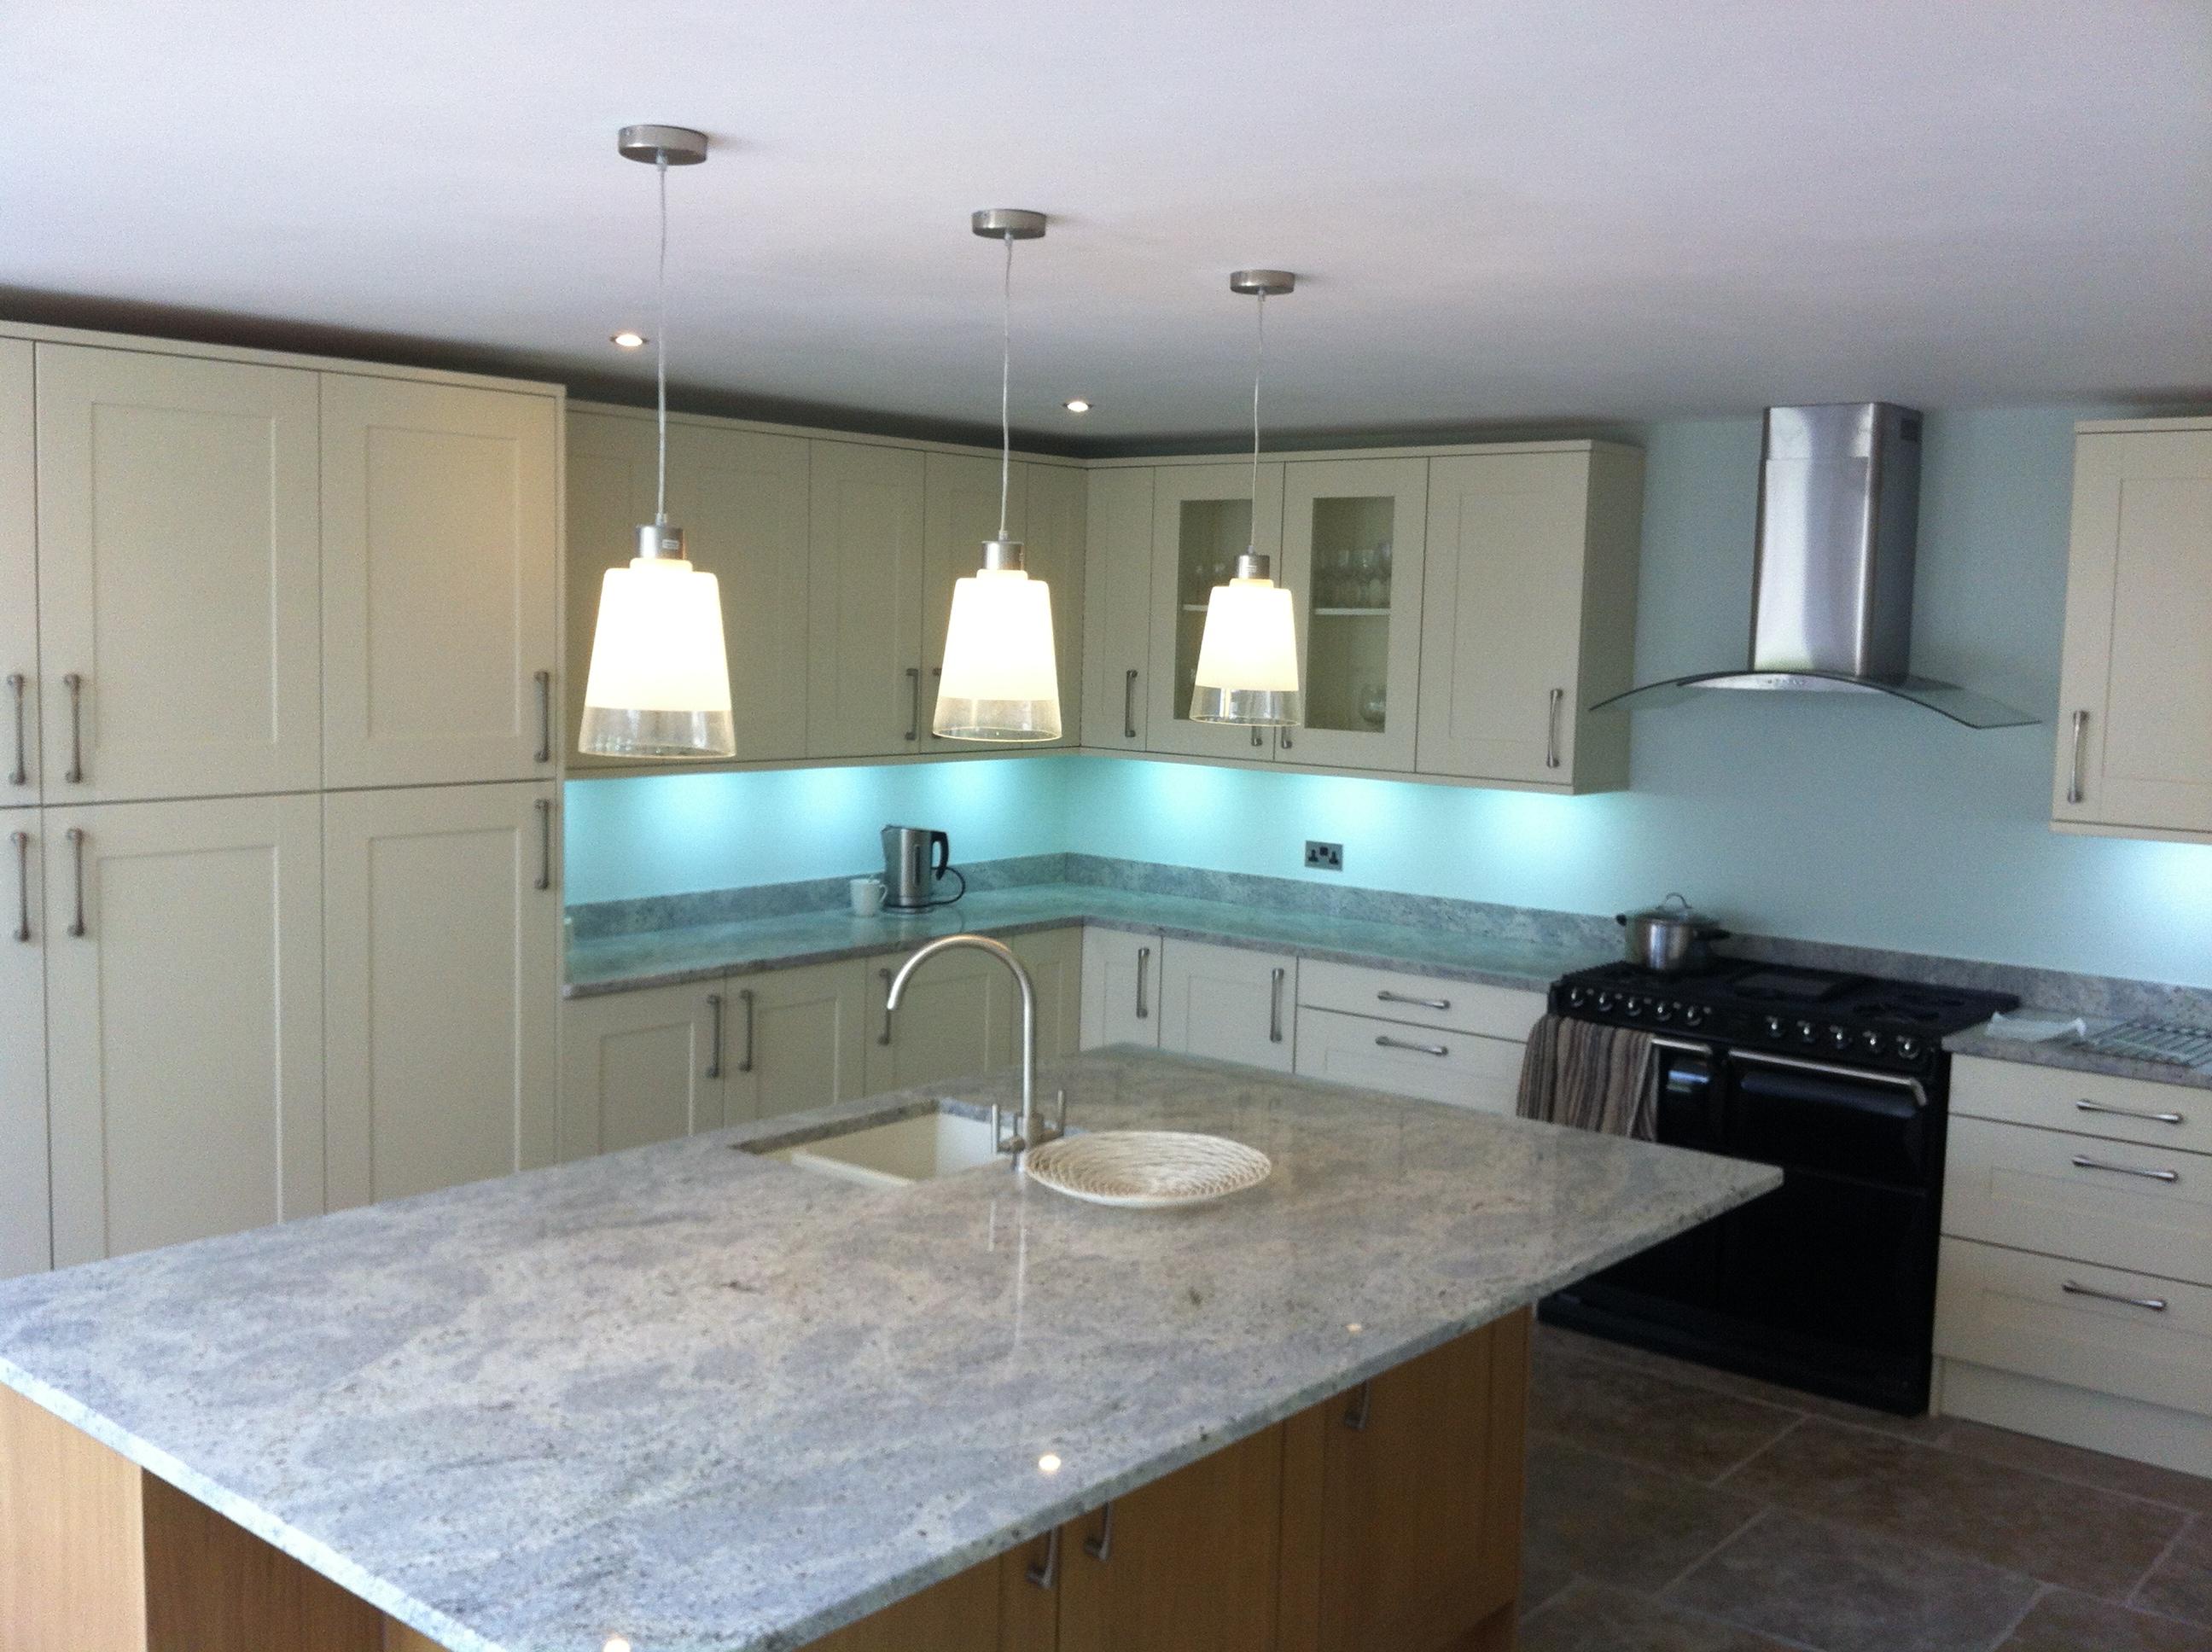 Kitchen Light fittings